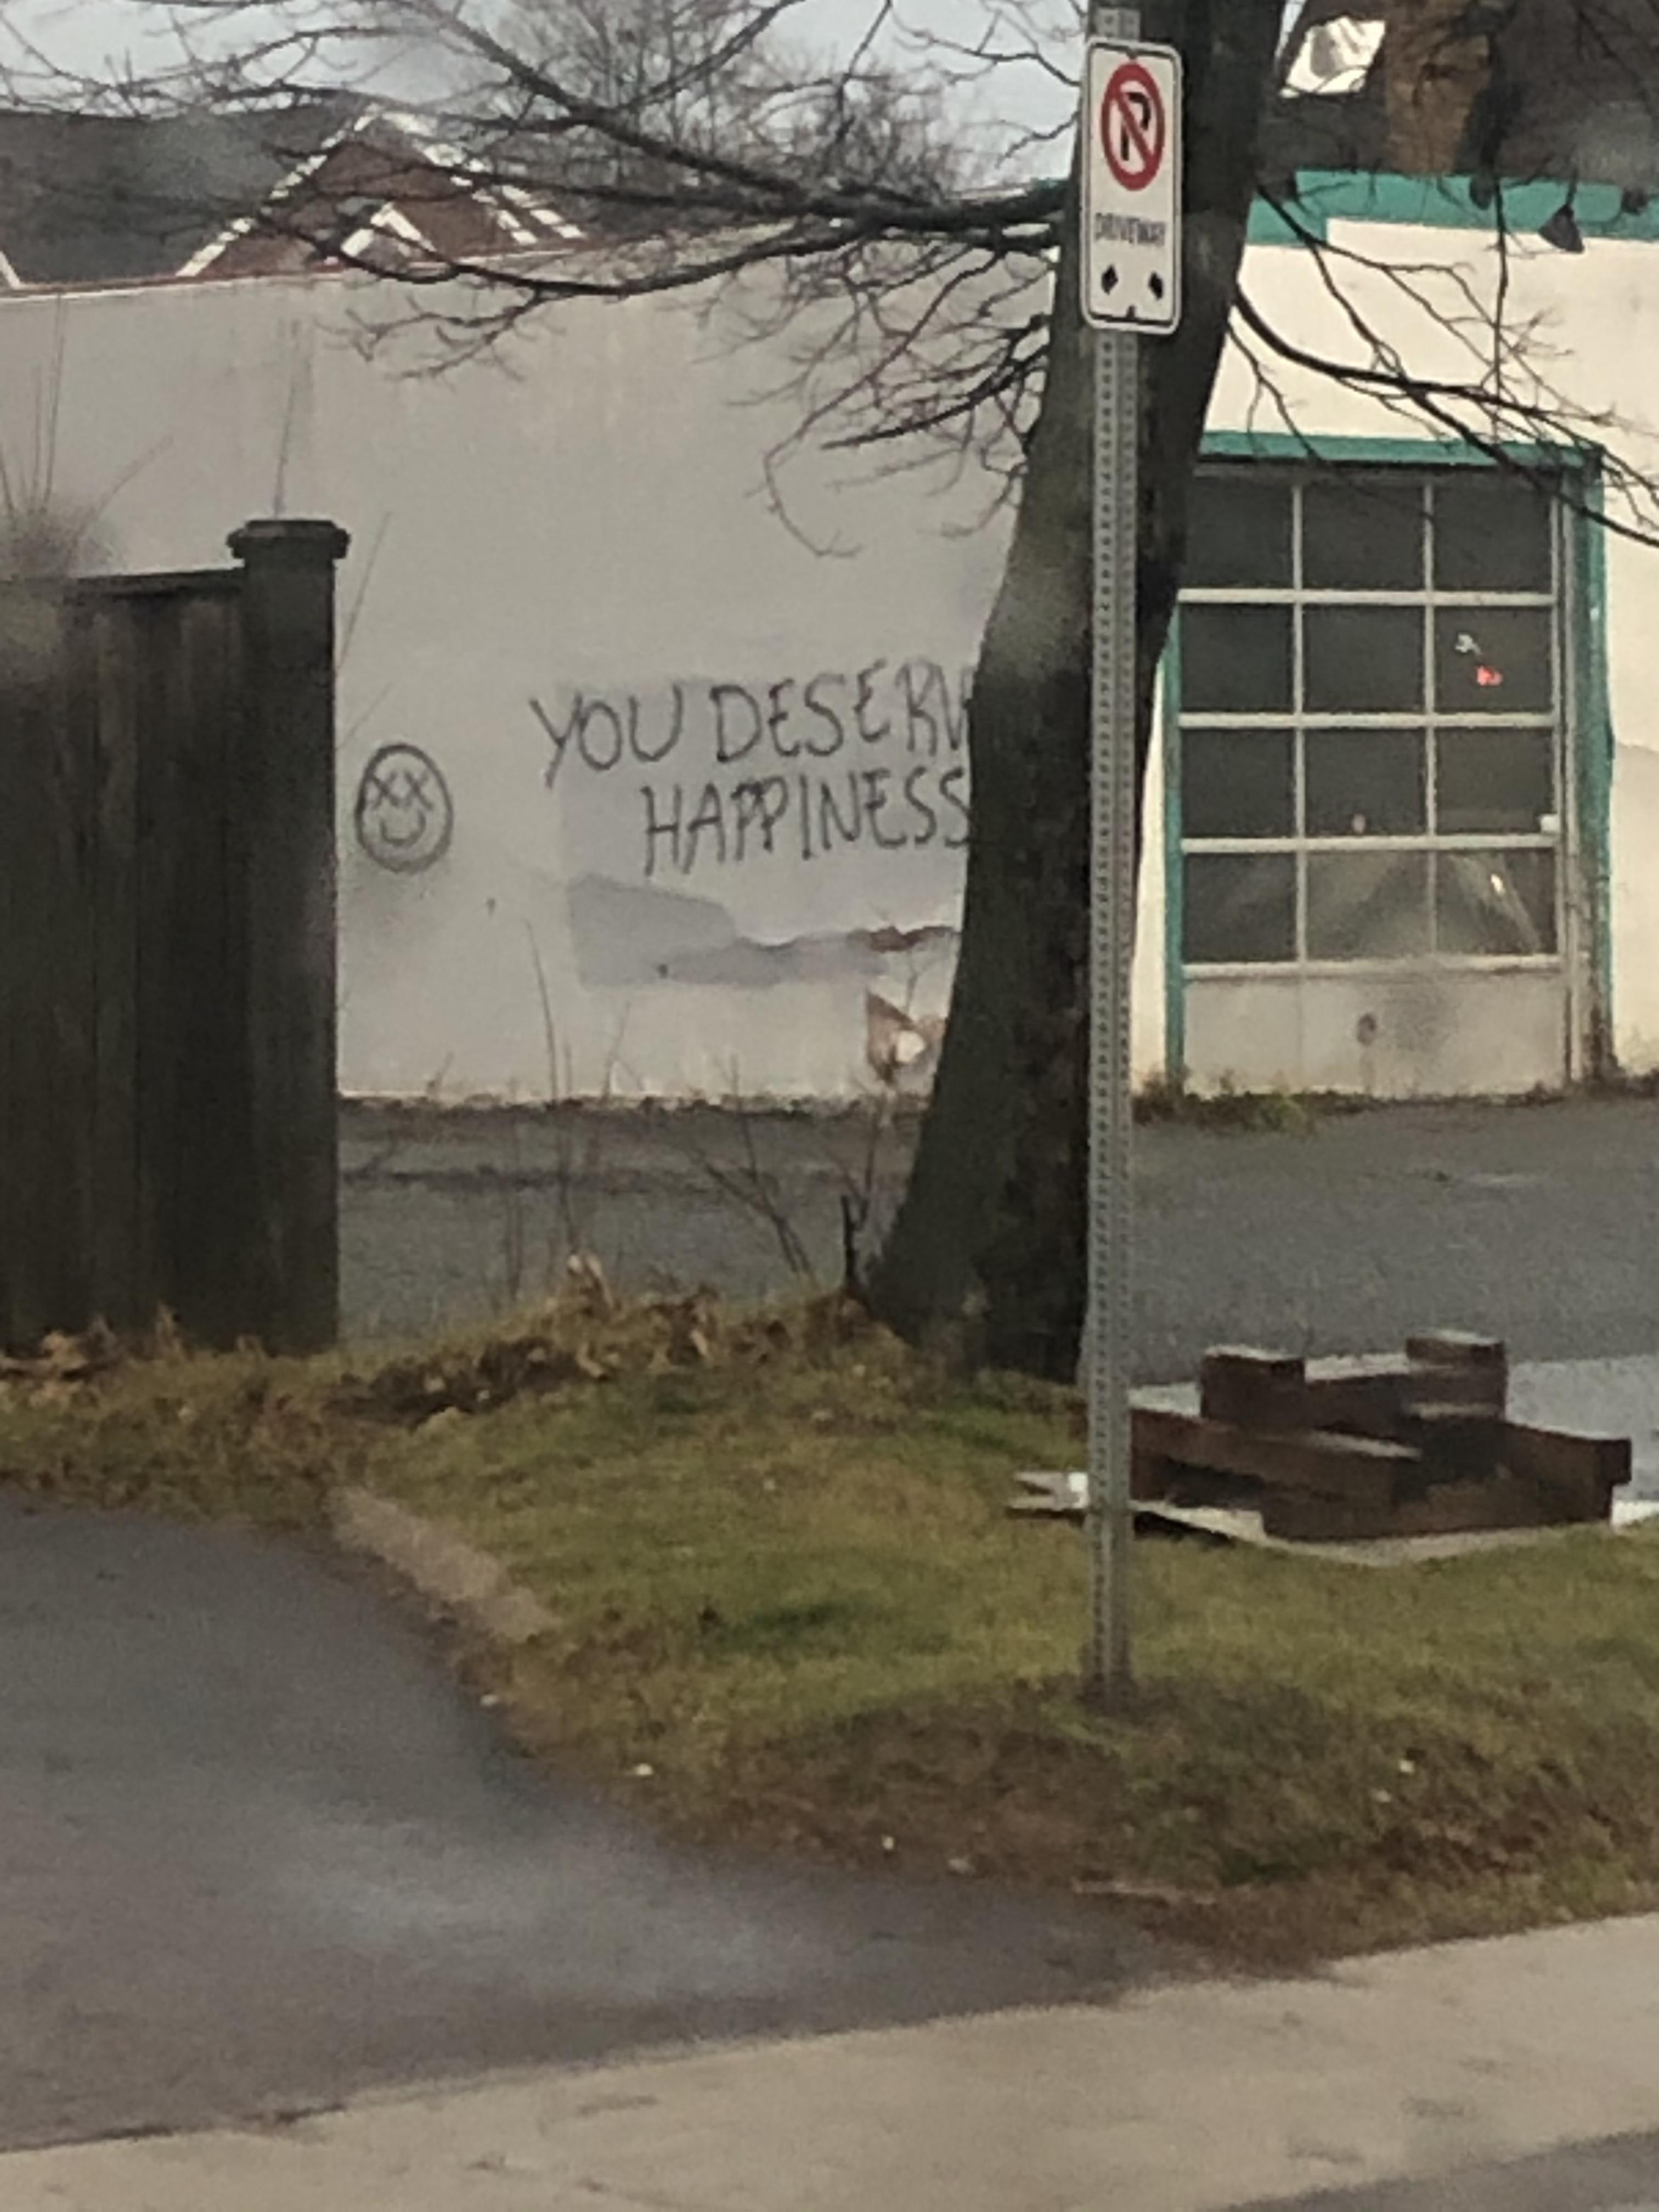 Canadian vandals strike again.